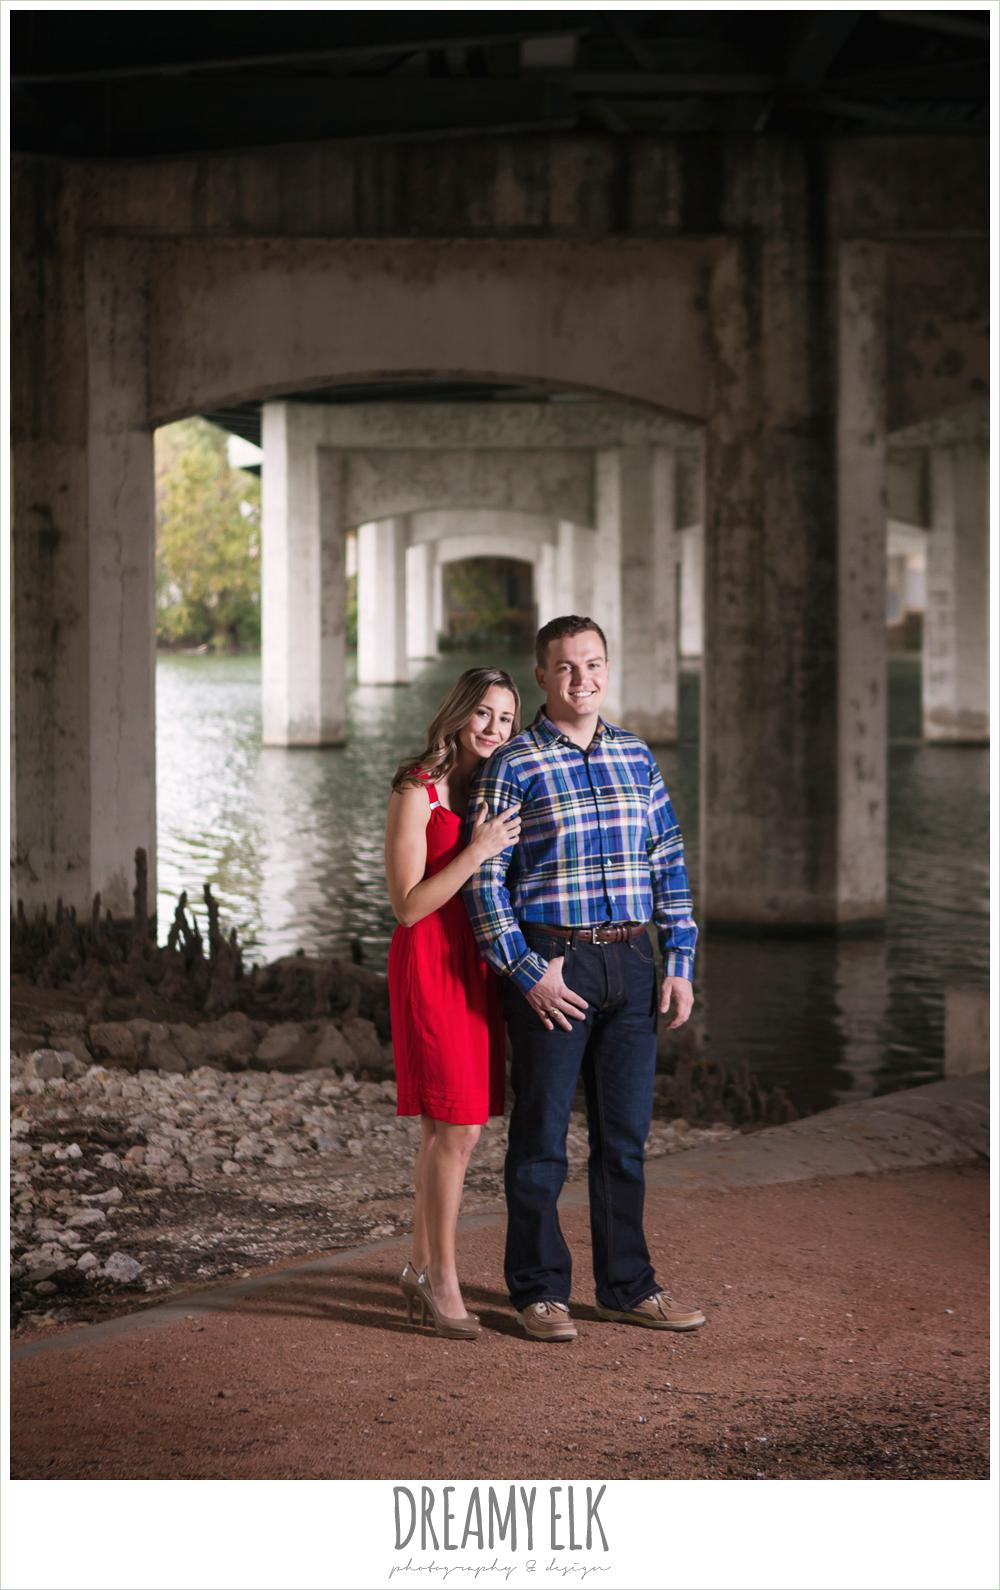 outdoor downtown austin engagement photo under a bridge {dreamy elk photography and design}